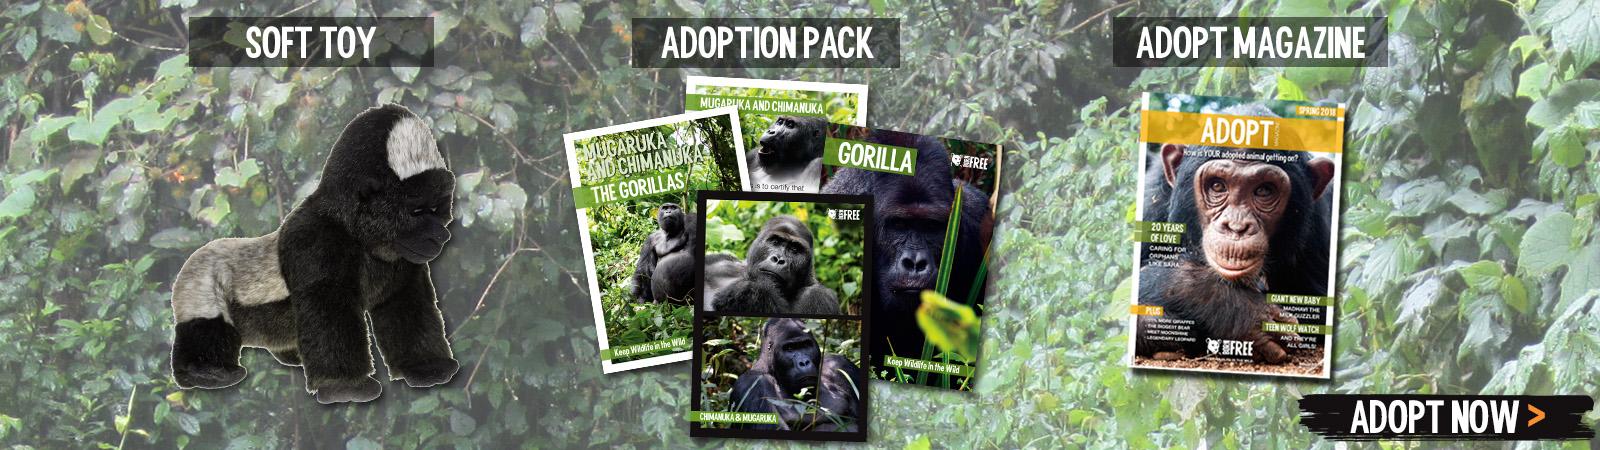 Sponsor a Gorilla